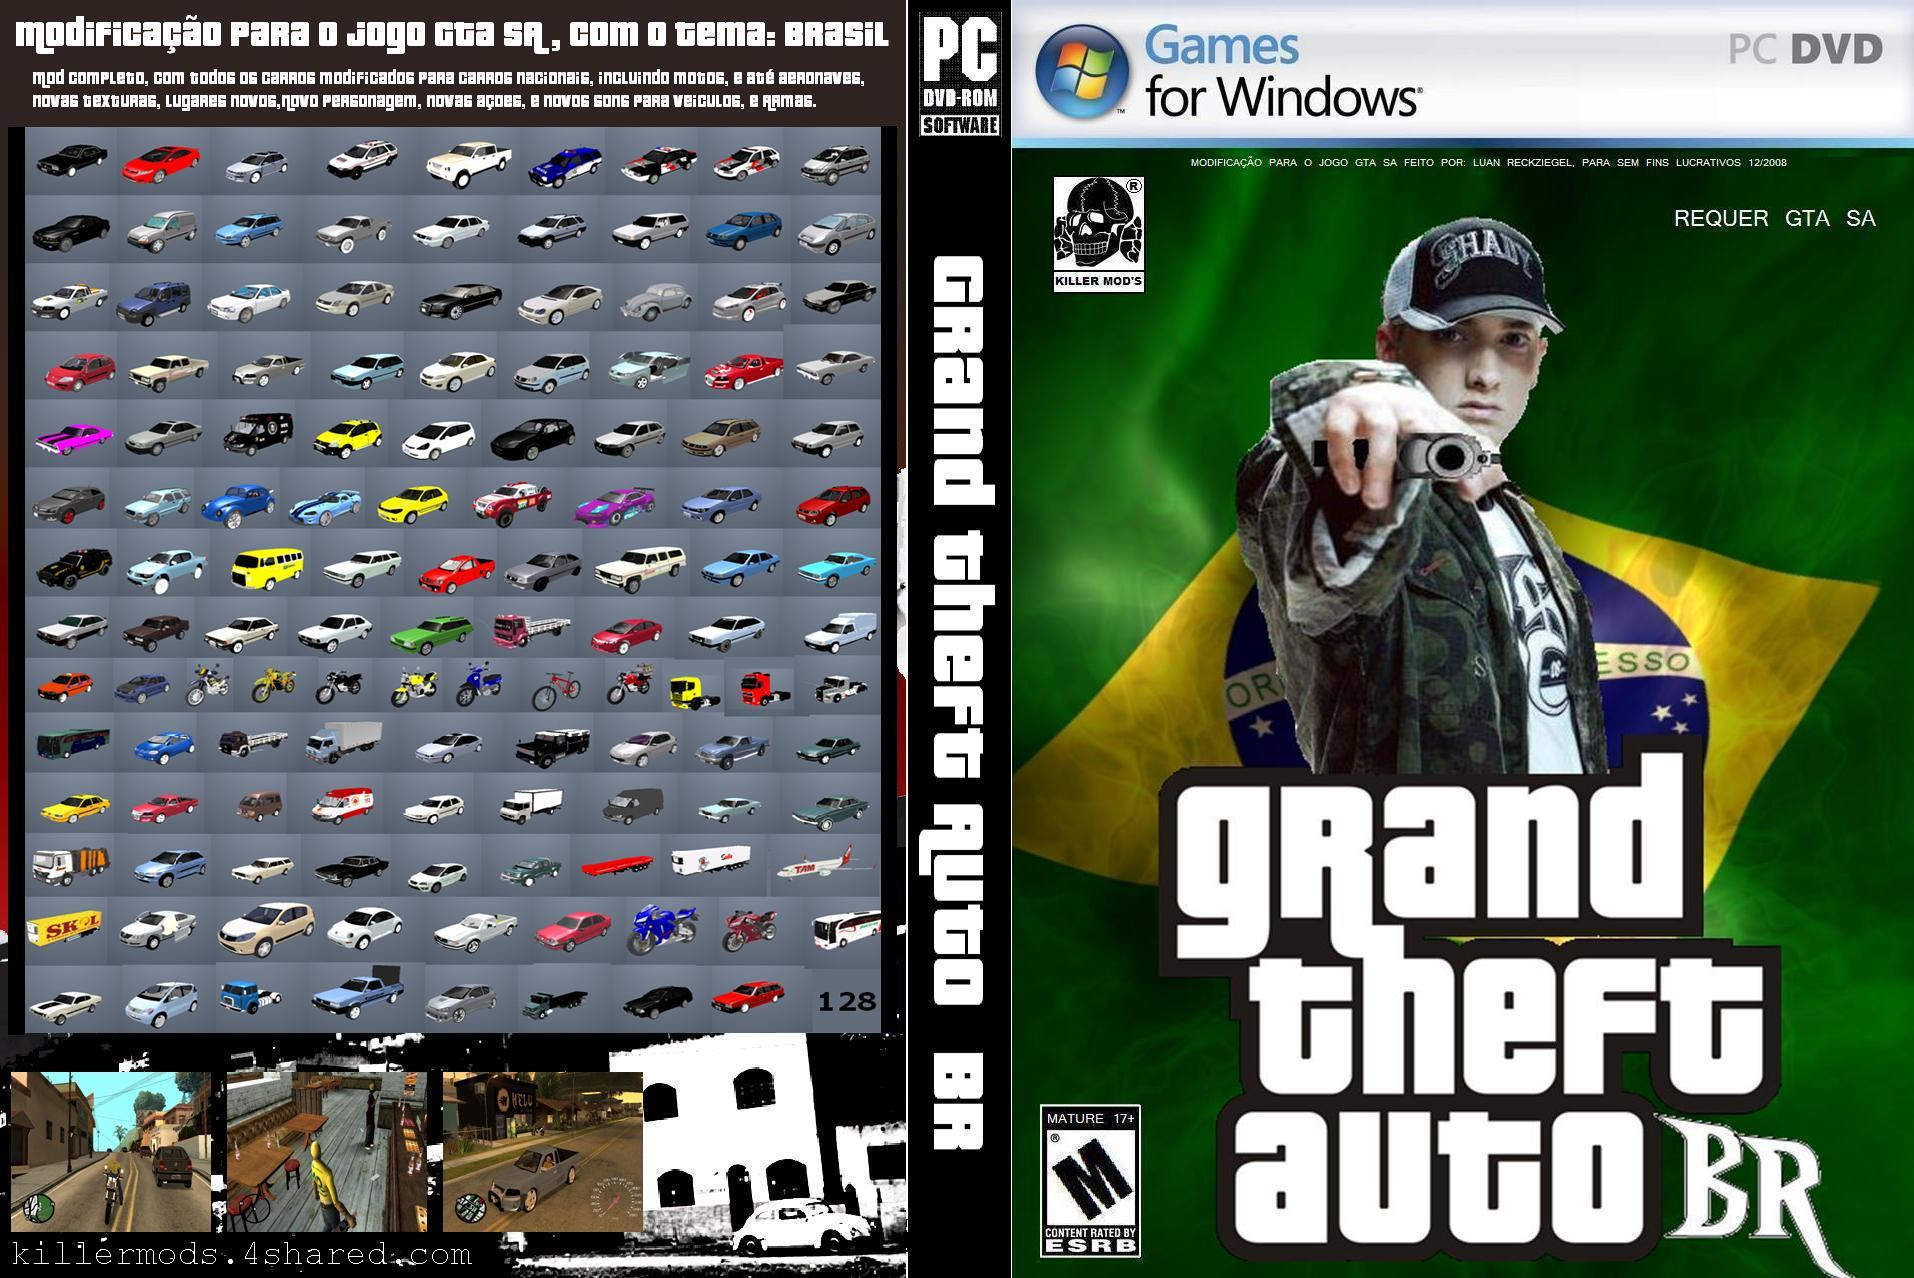 utorrent download game gta vice city